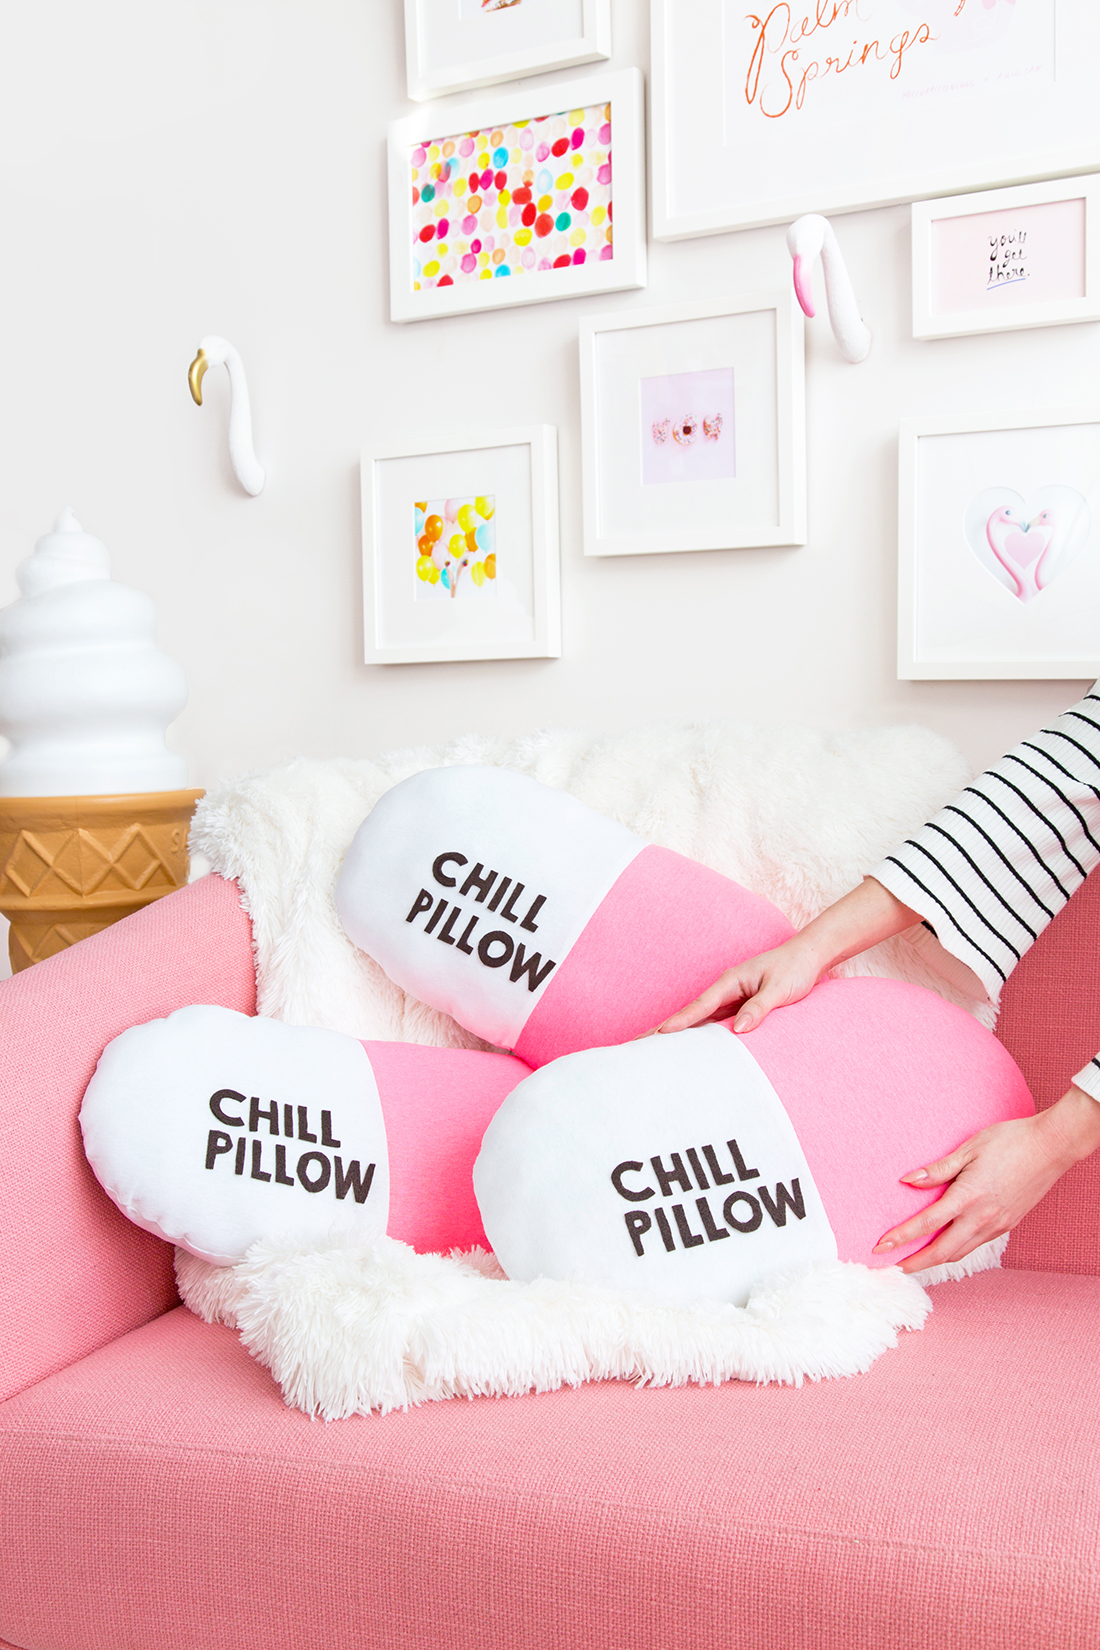 Easy DIY Chill Pillow